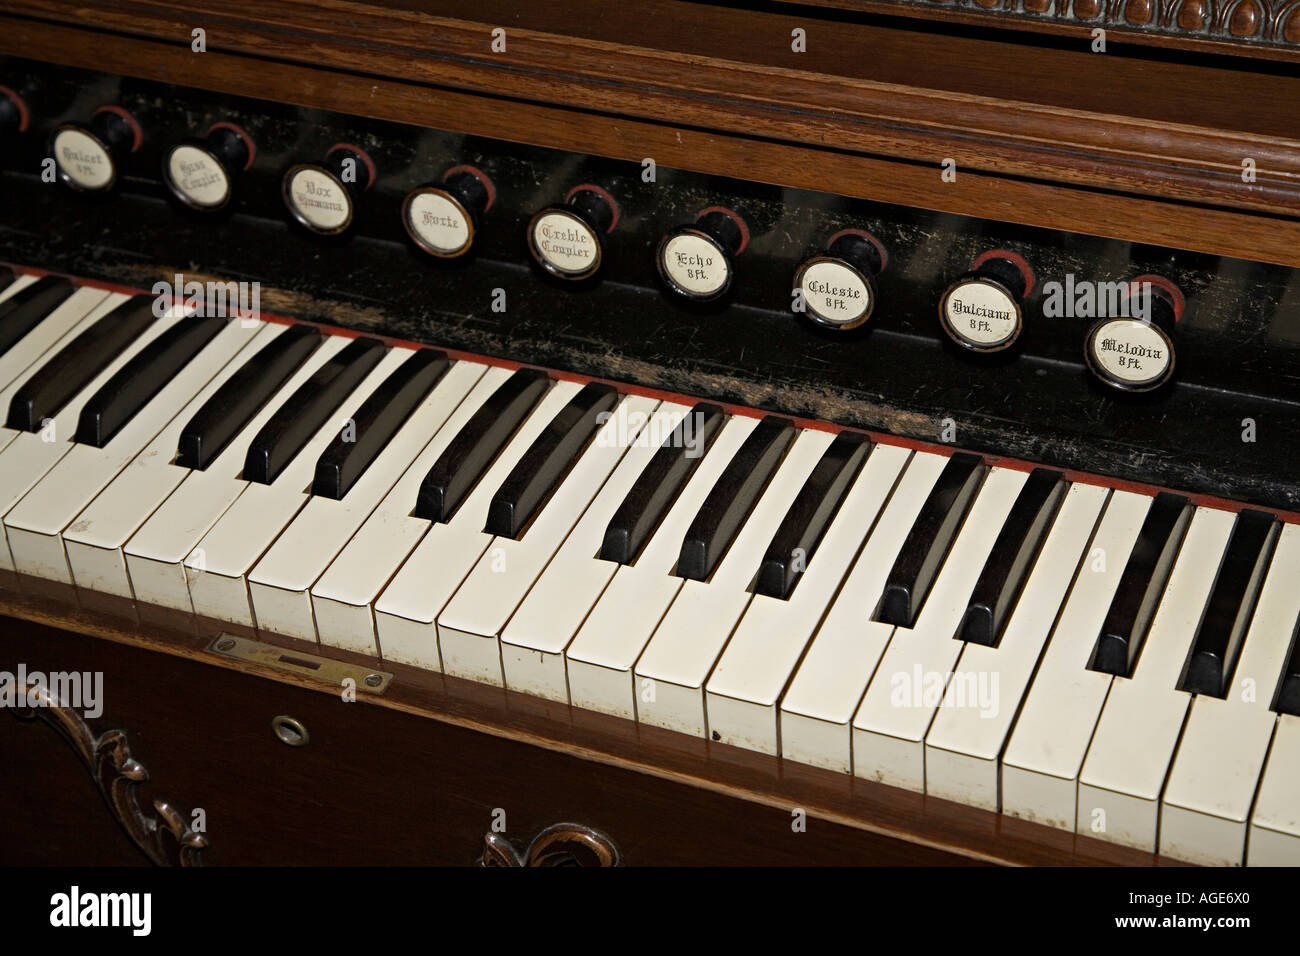 Old Organ Keyboard Organ Stops Stock Photos & Old Organ Keyboard